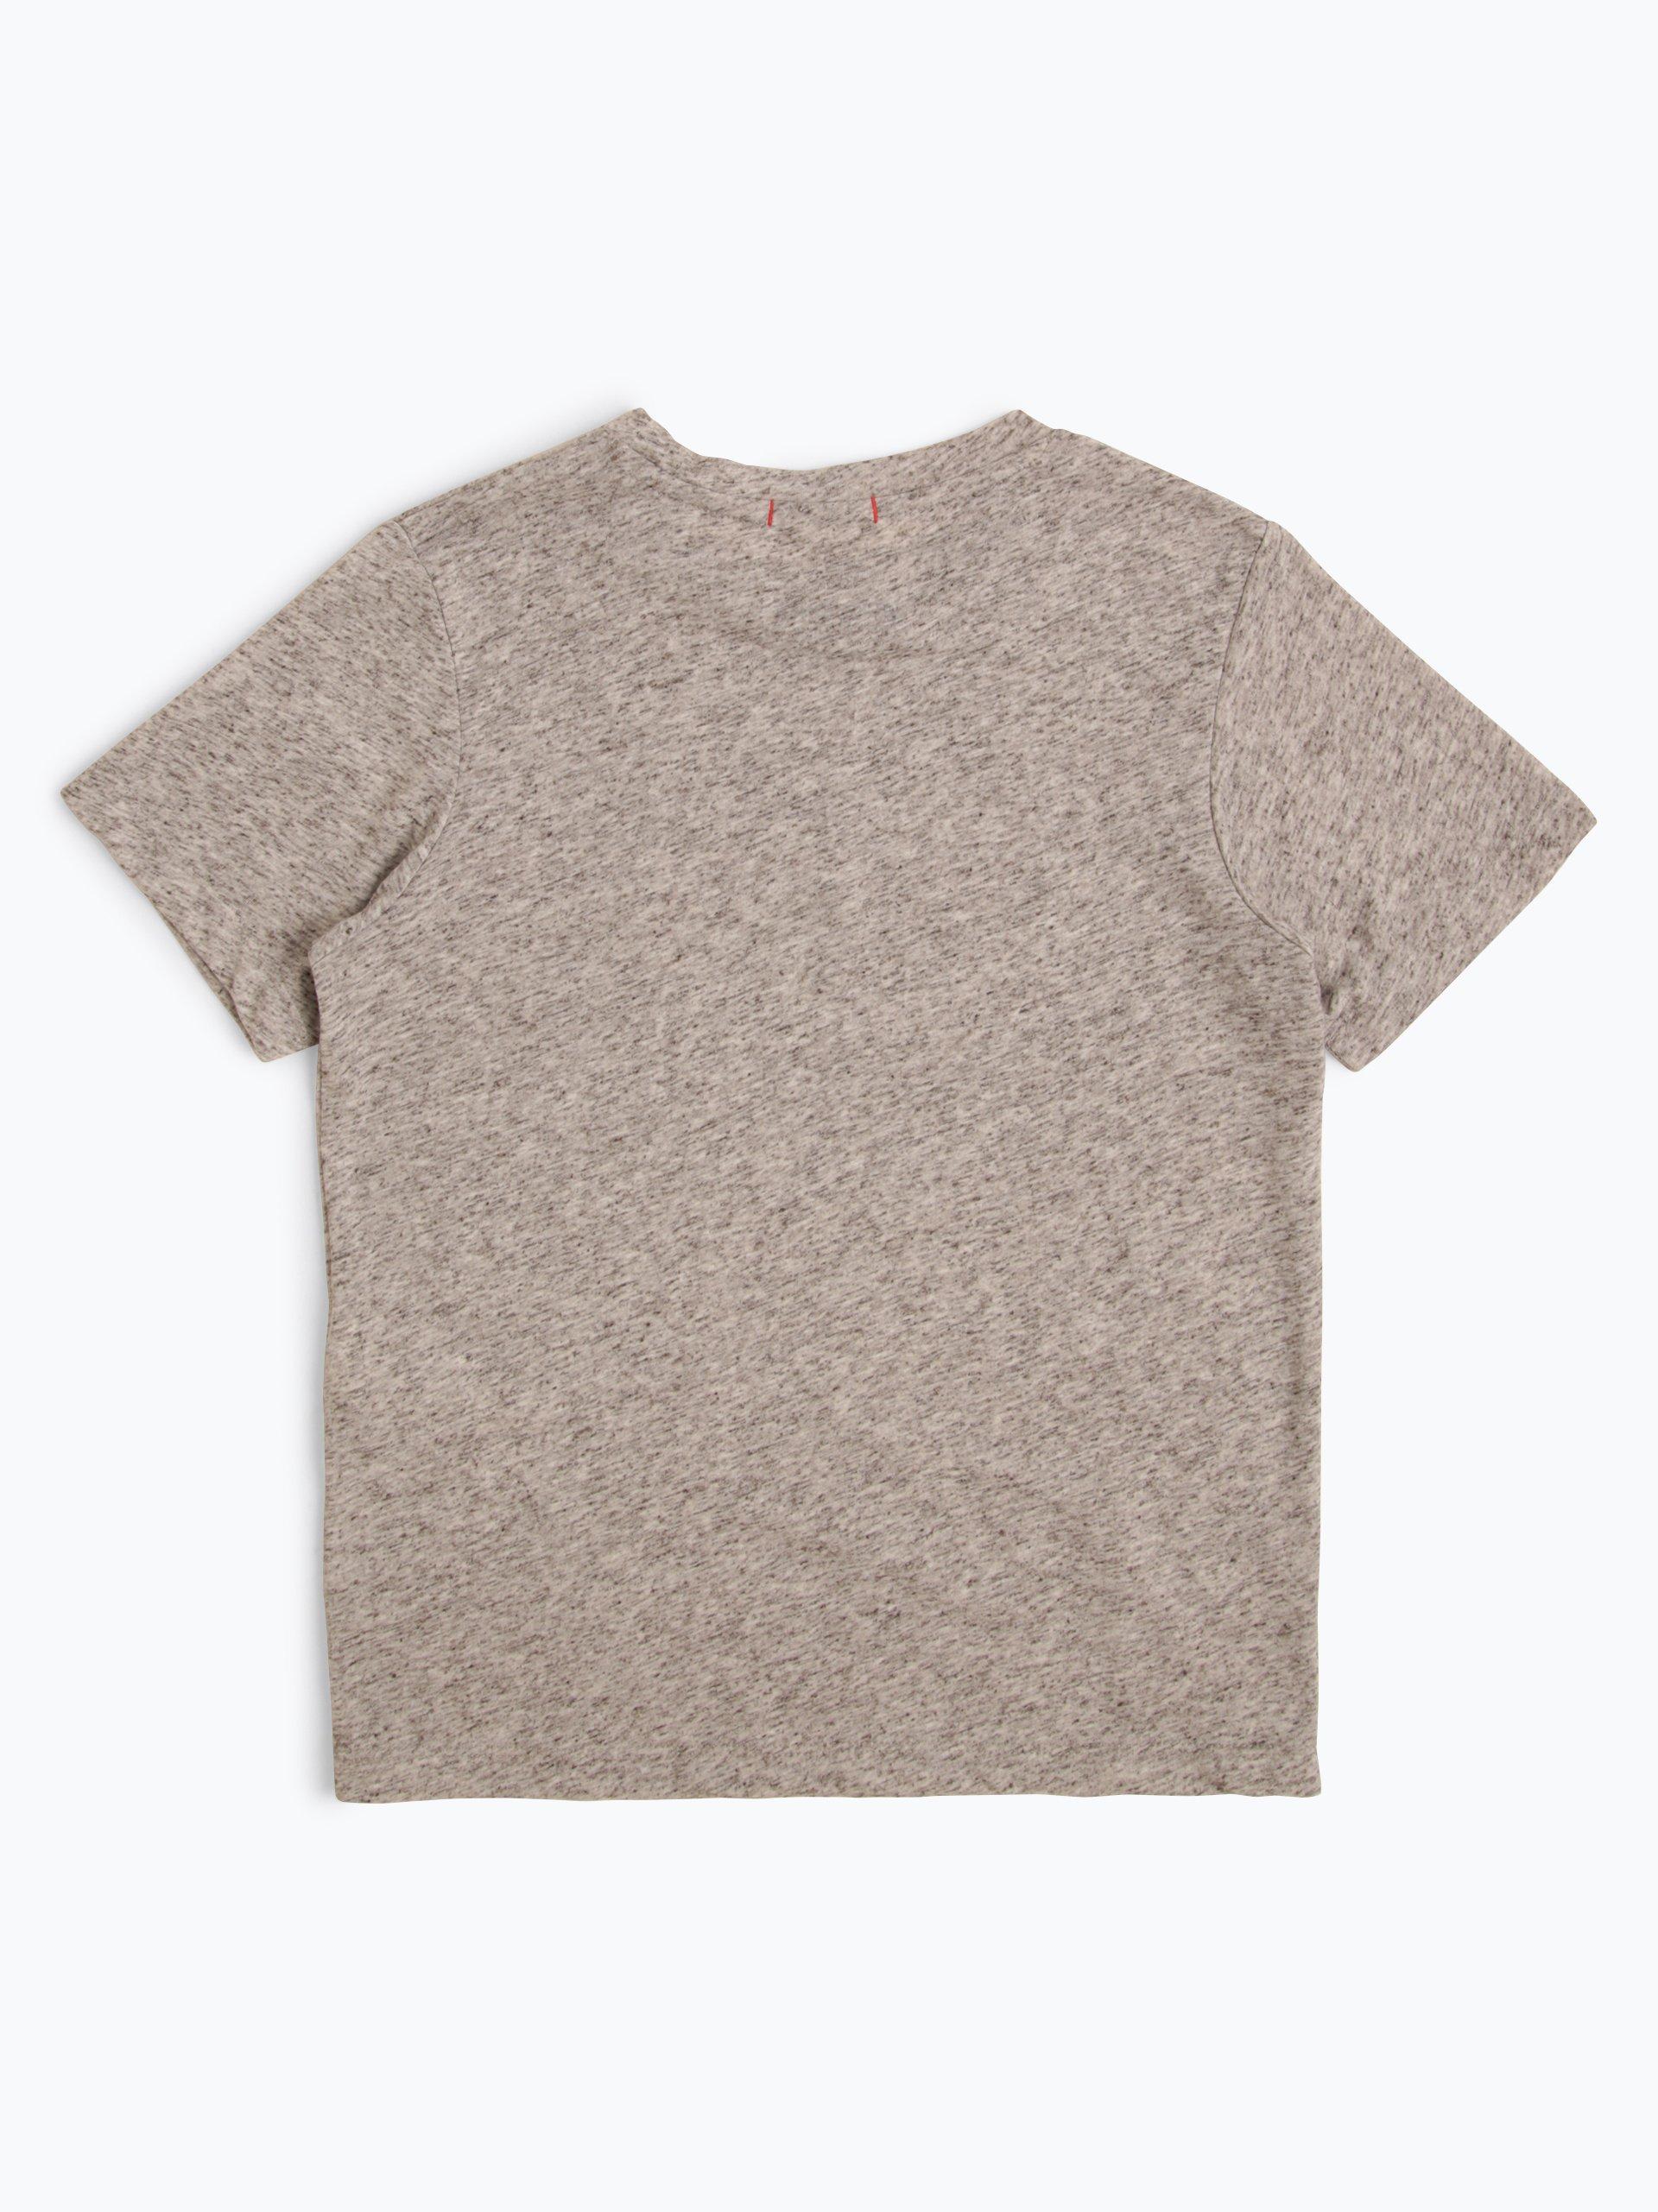 Jack & Jones Jungen T-Shirt mit Leinen-Anteil - Jortuco